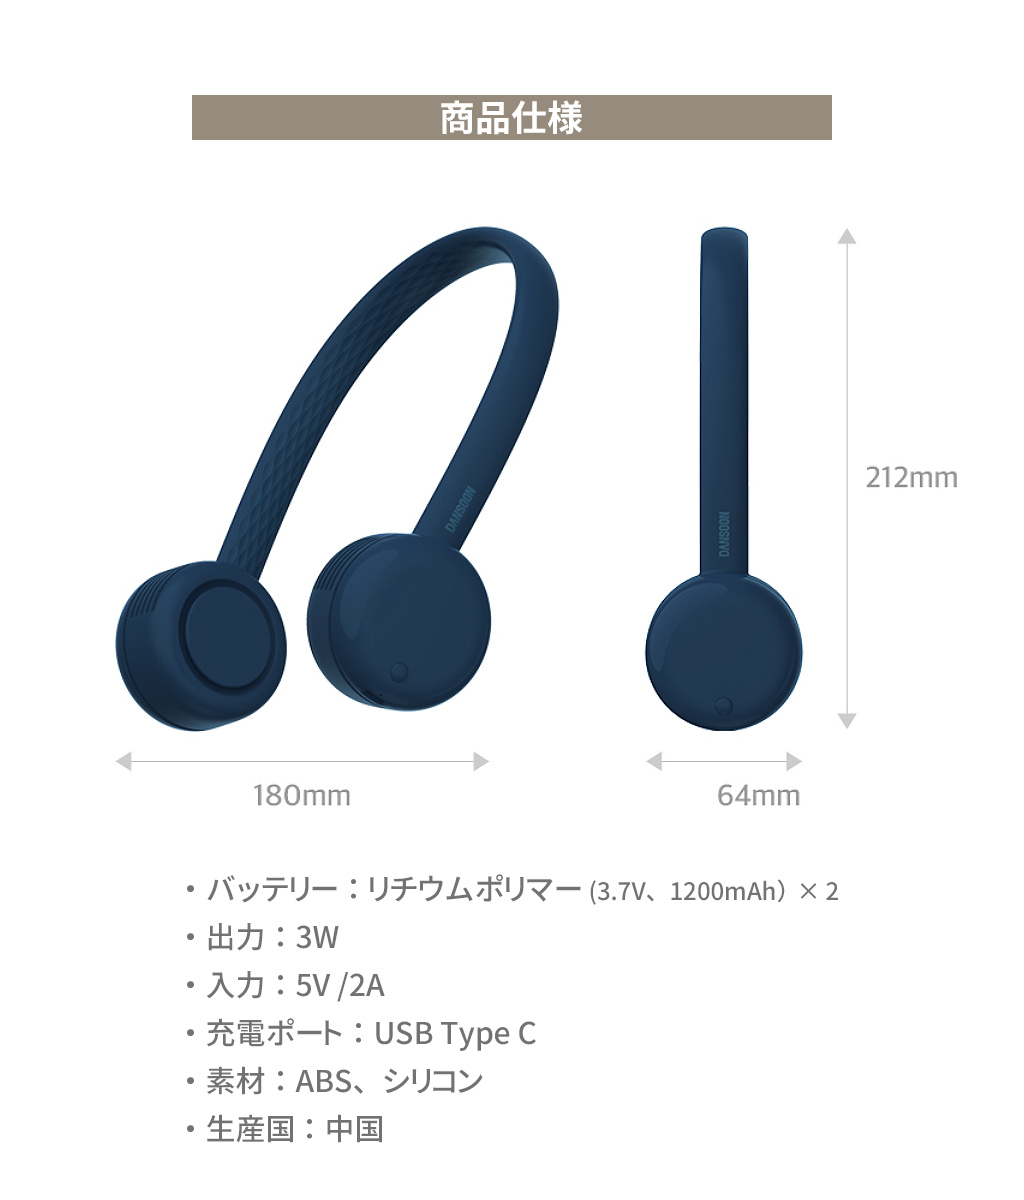 FLEX 羽根なし首かけ扇風機日本語パッケージ、構成品